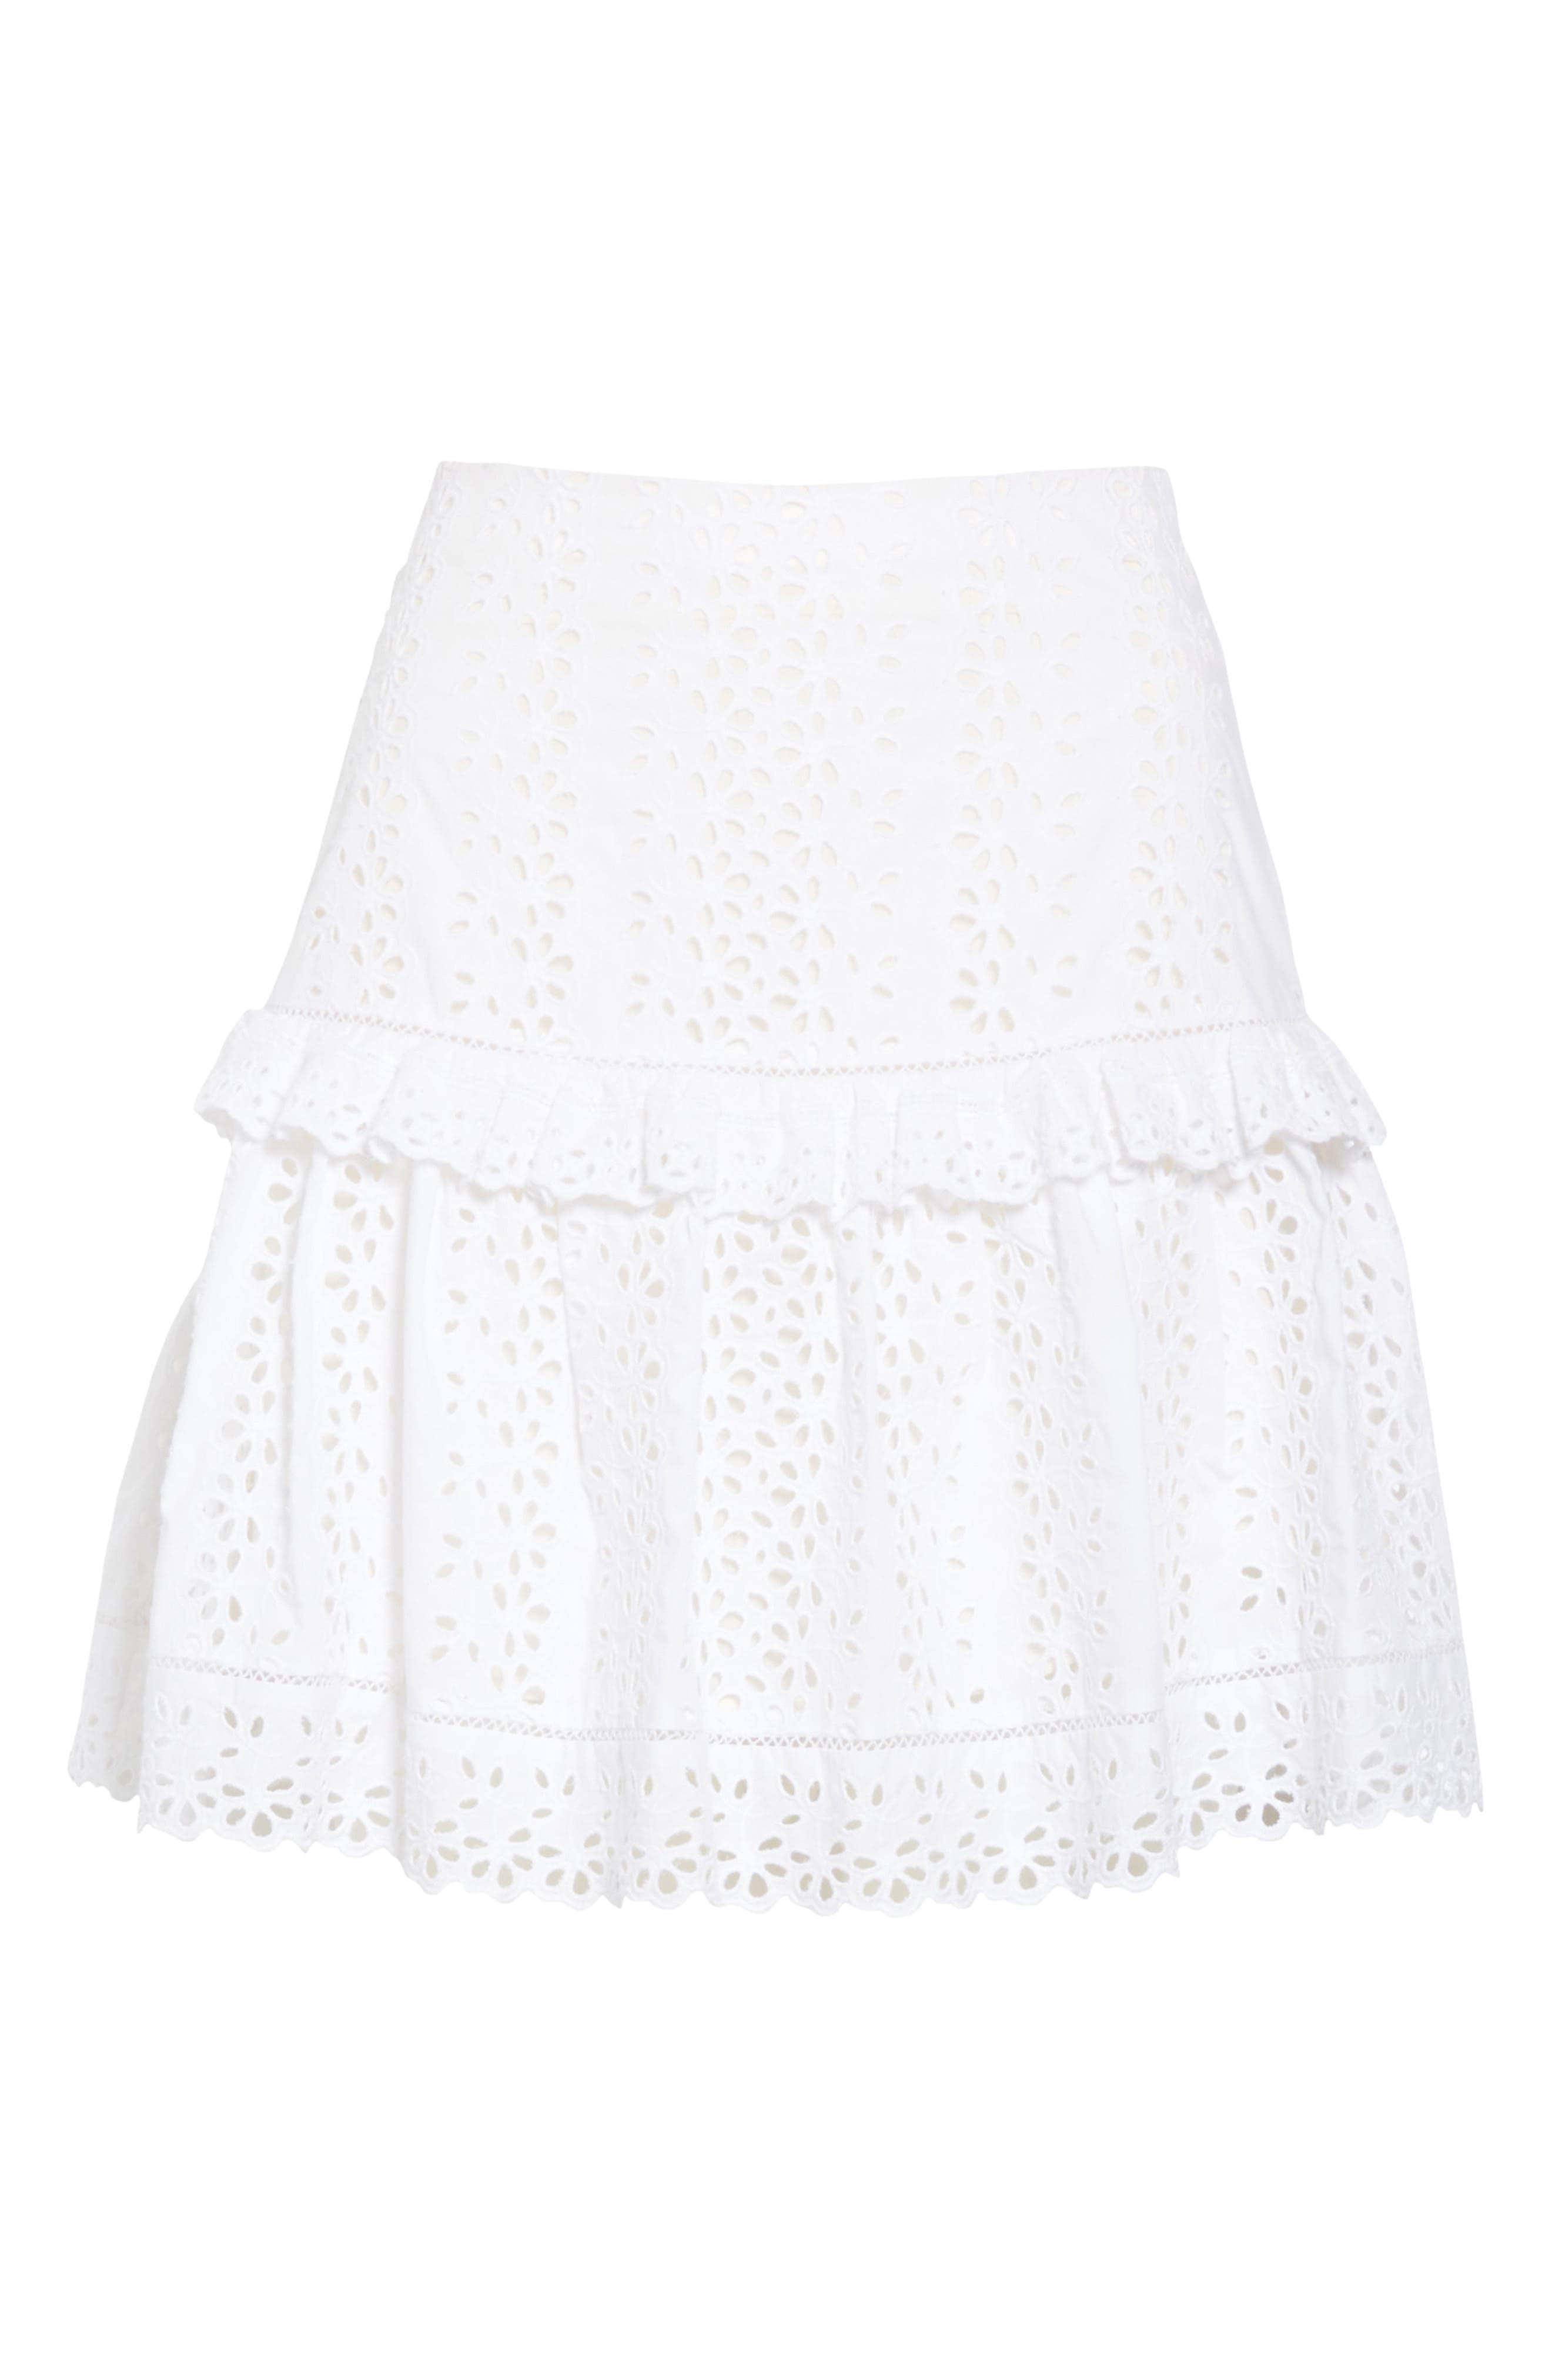 REBECCA TAYLOR, Karina Cotton Eyelet Skirt, Alternate thumbnail 6, color, MILK